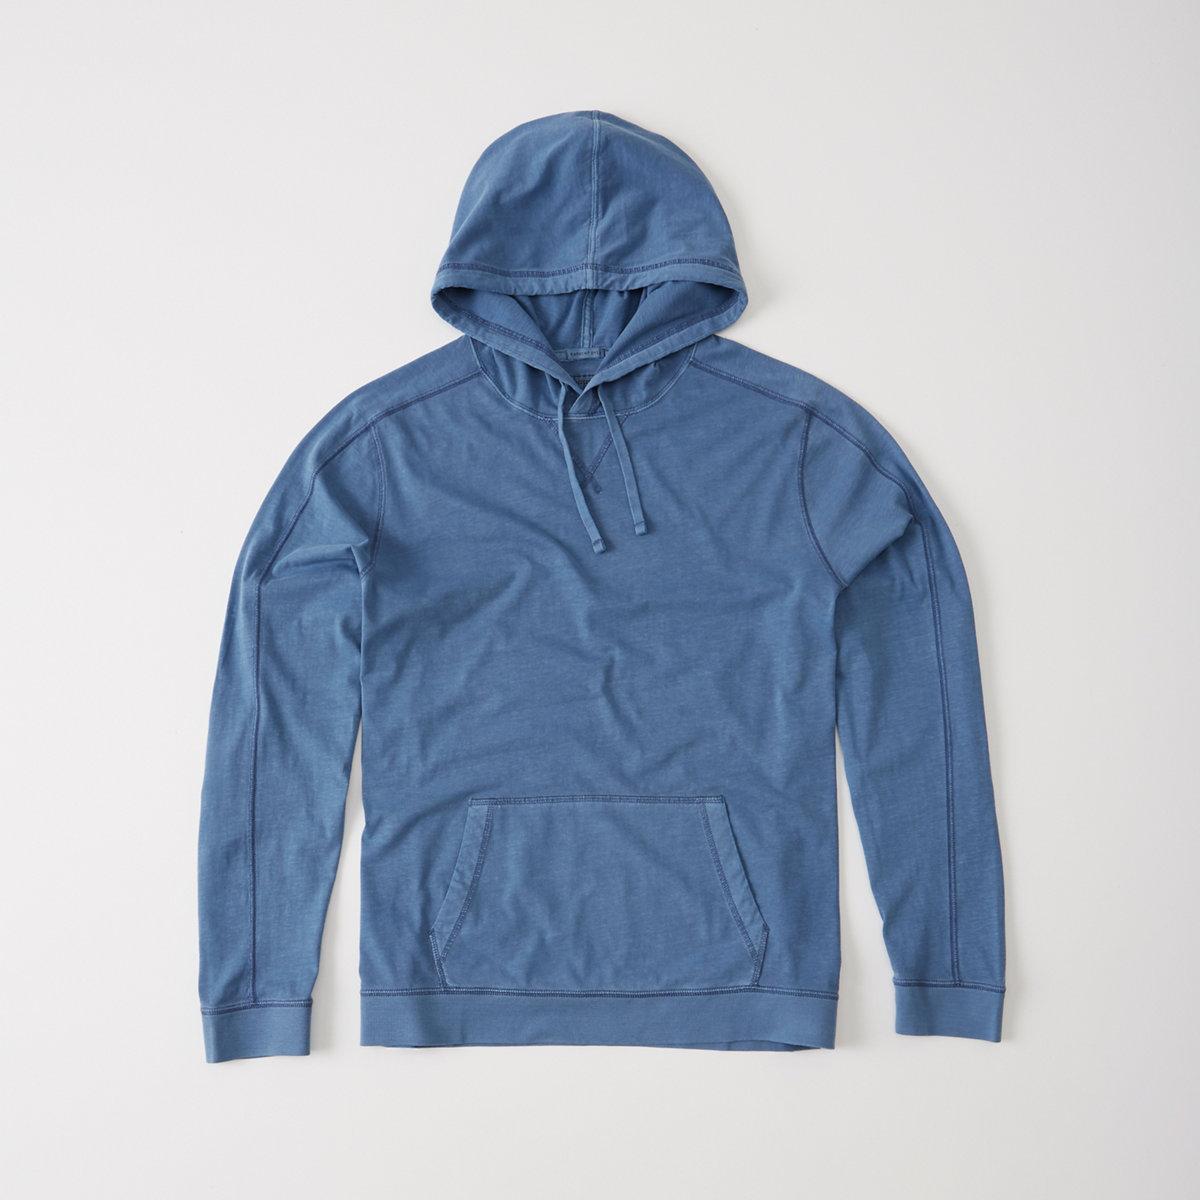 Garment Dye Hoodie